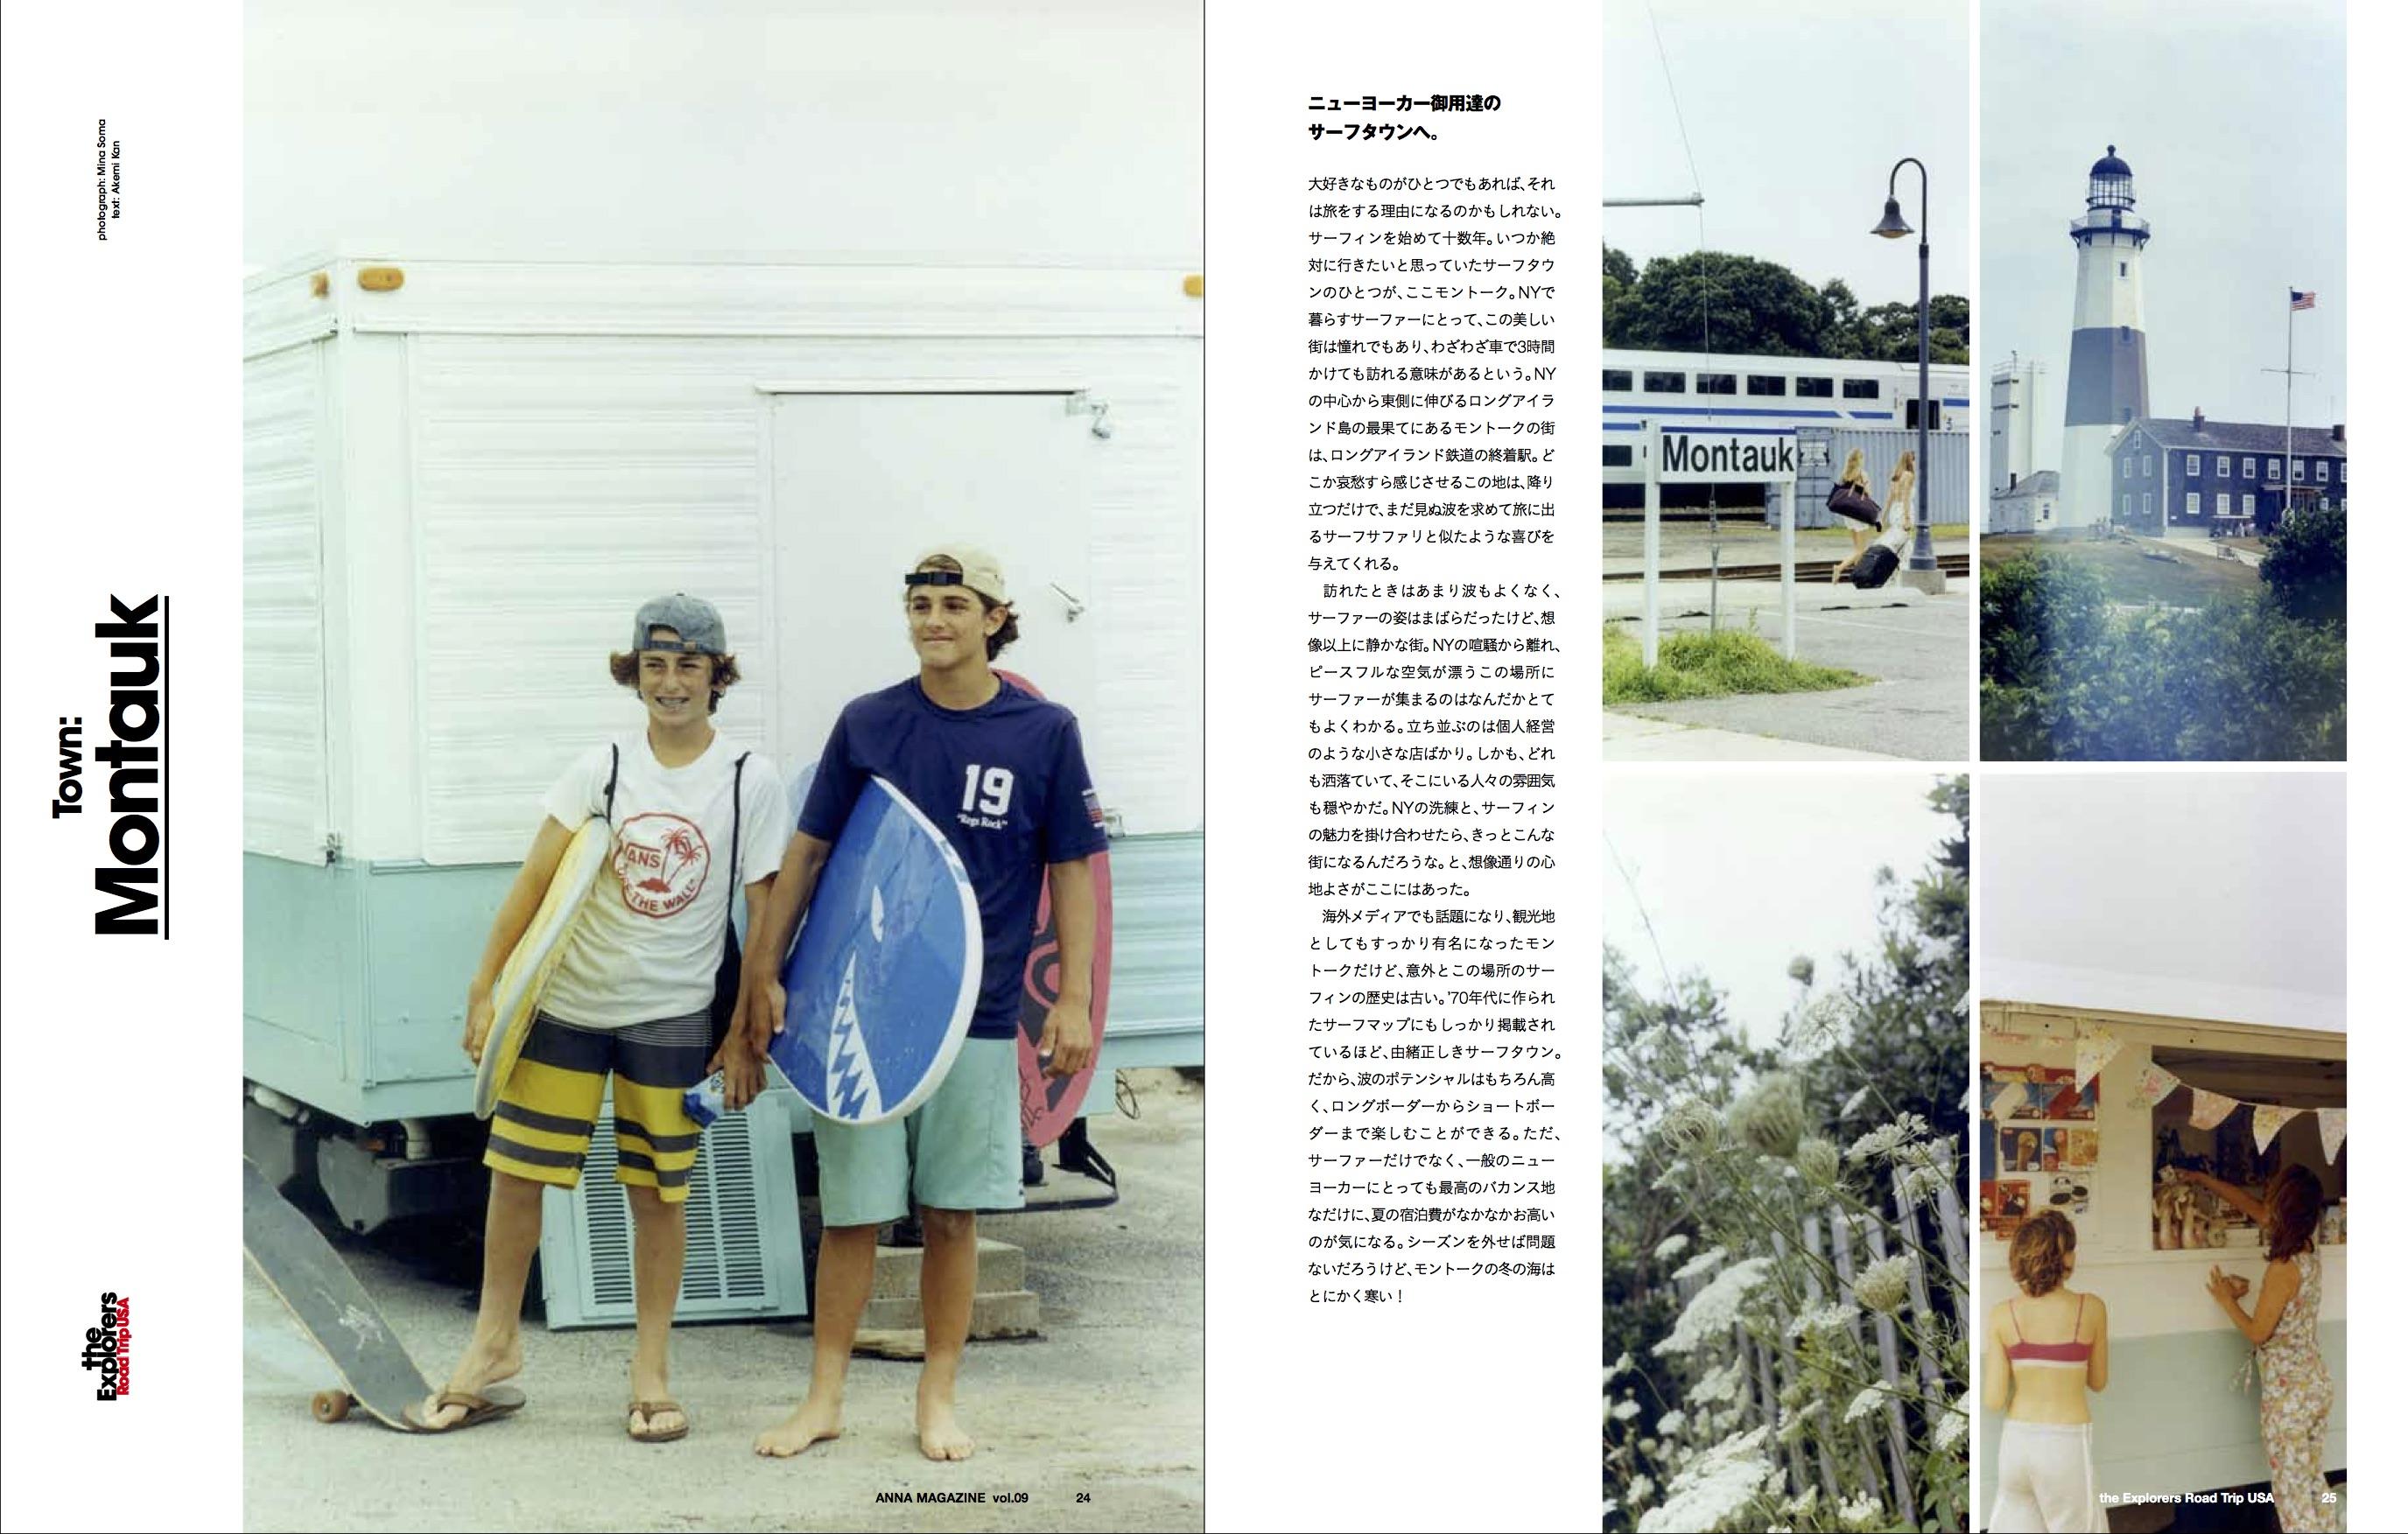 anna magazine vol.9 P11